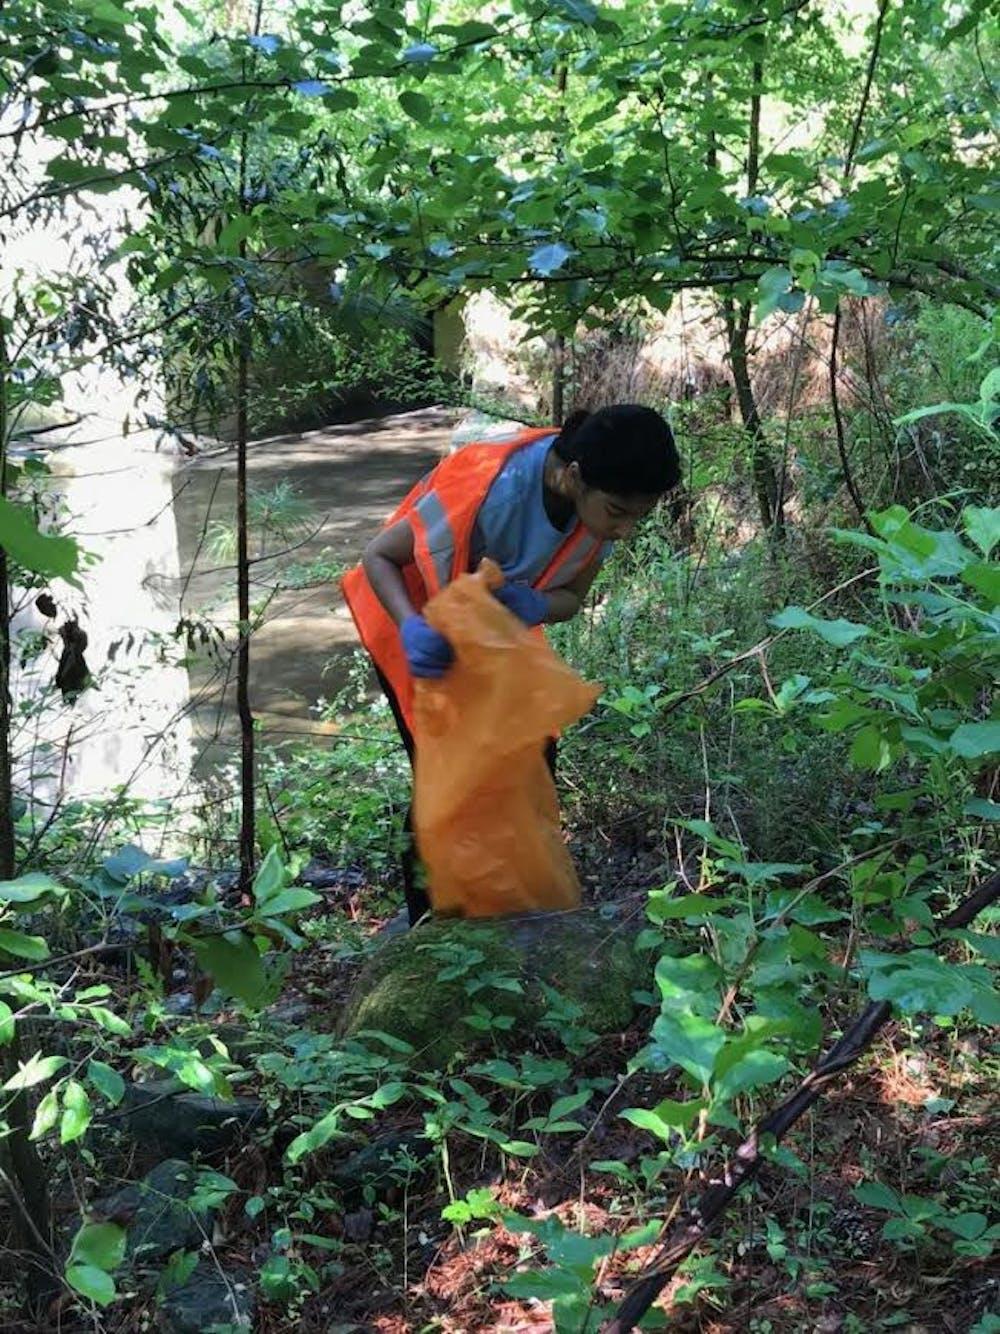 Q&A with environmental intern Haley Moser